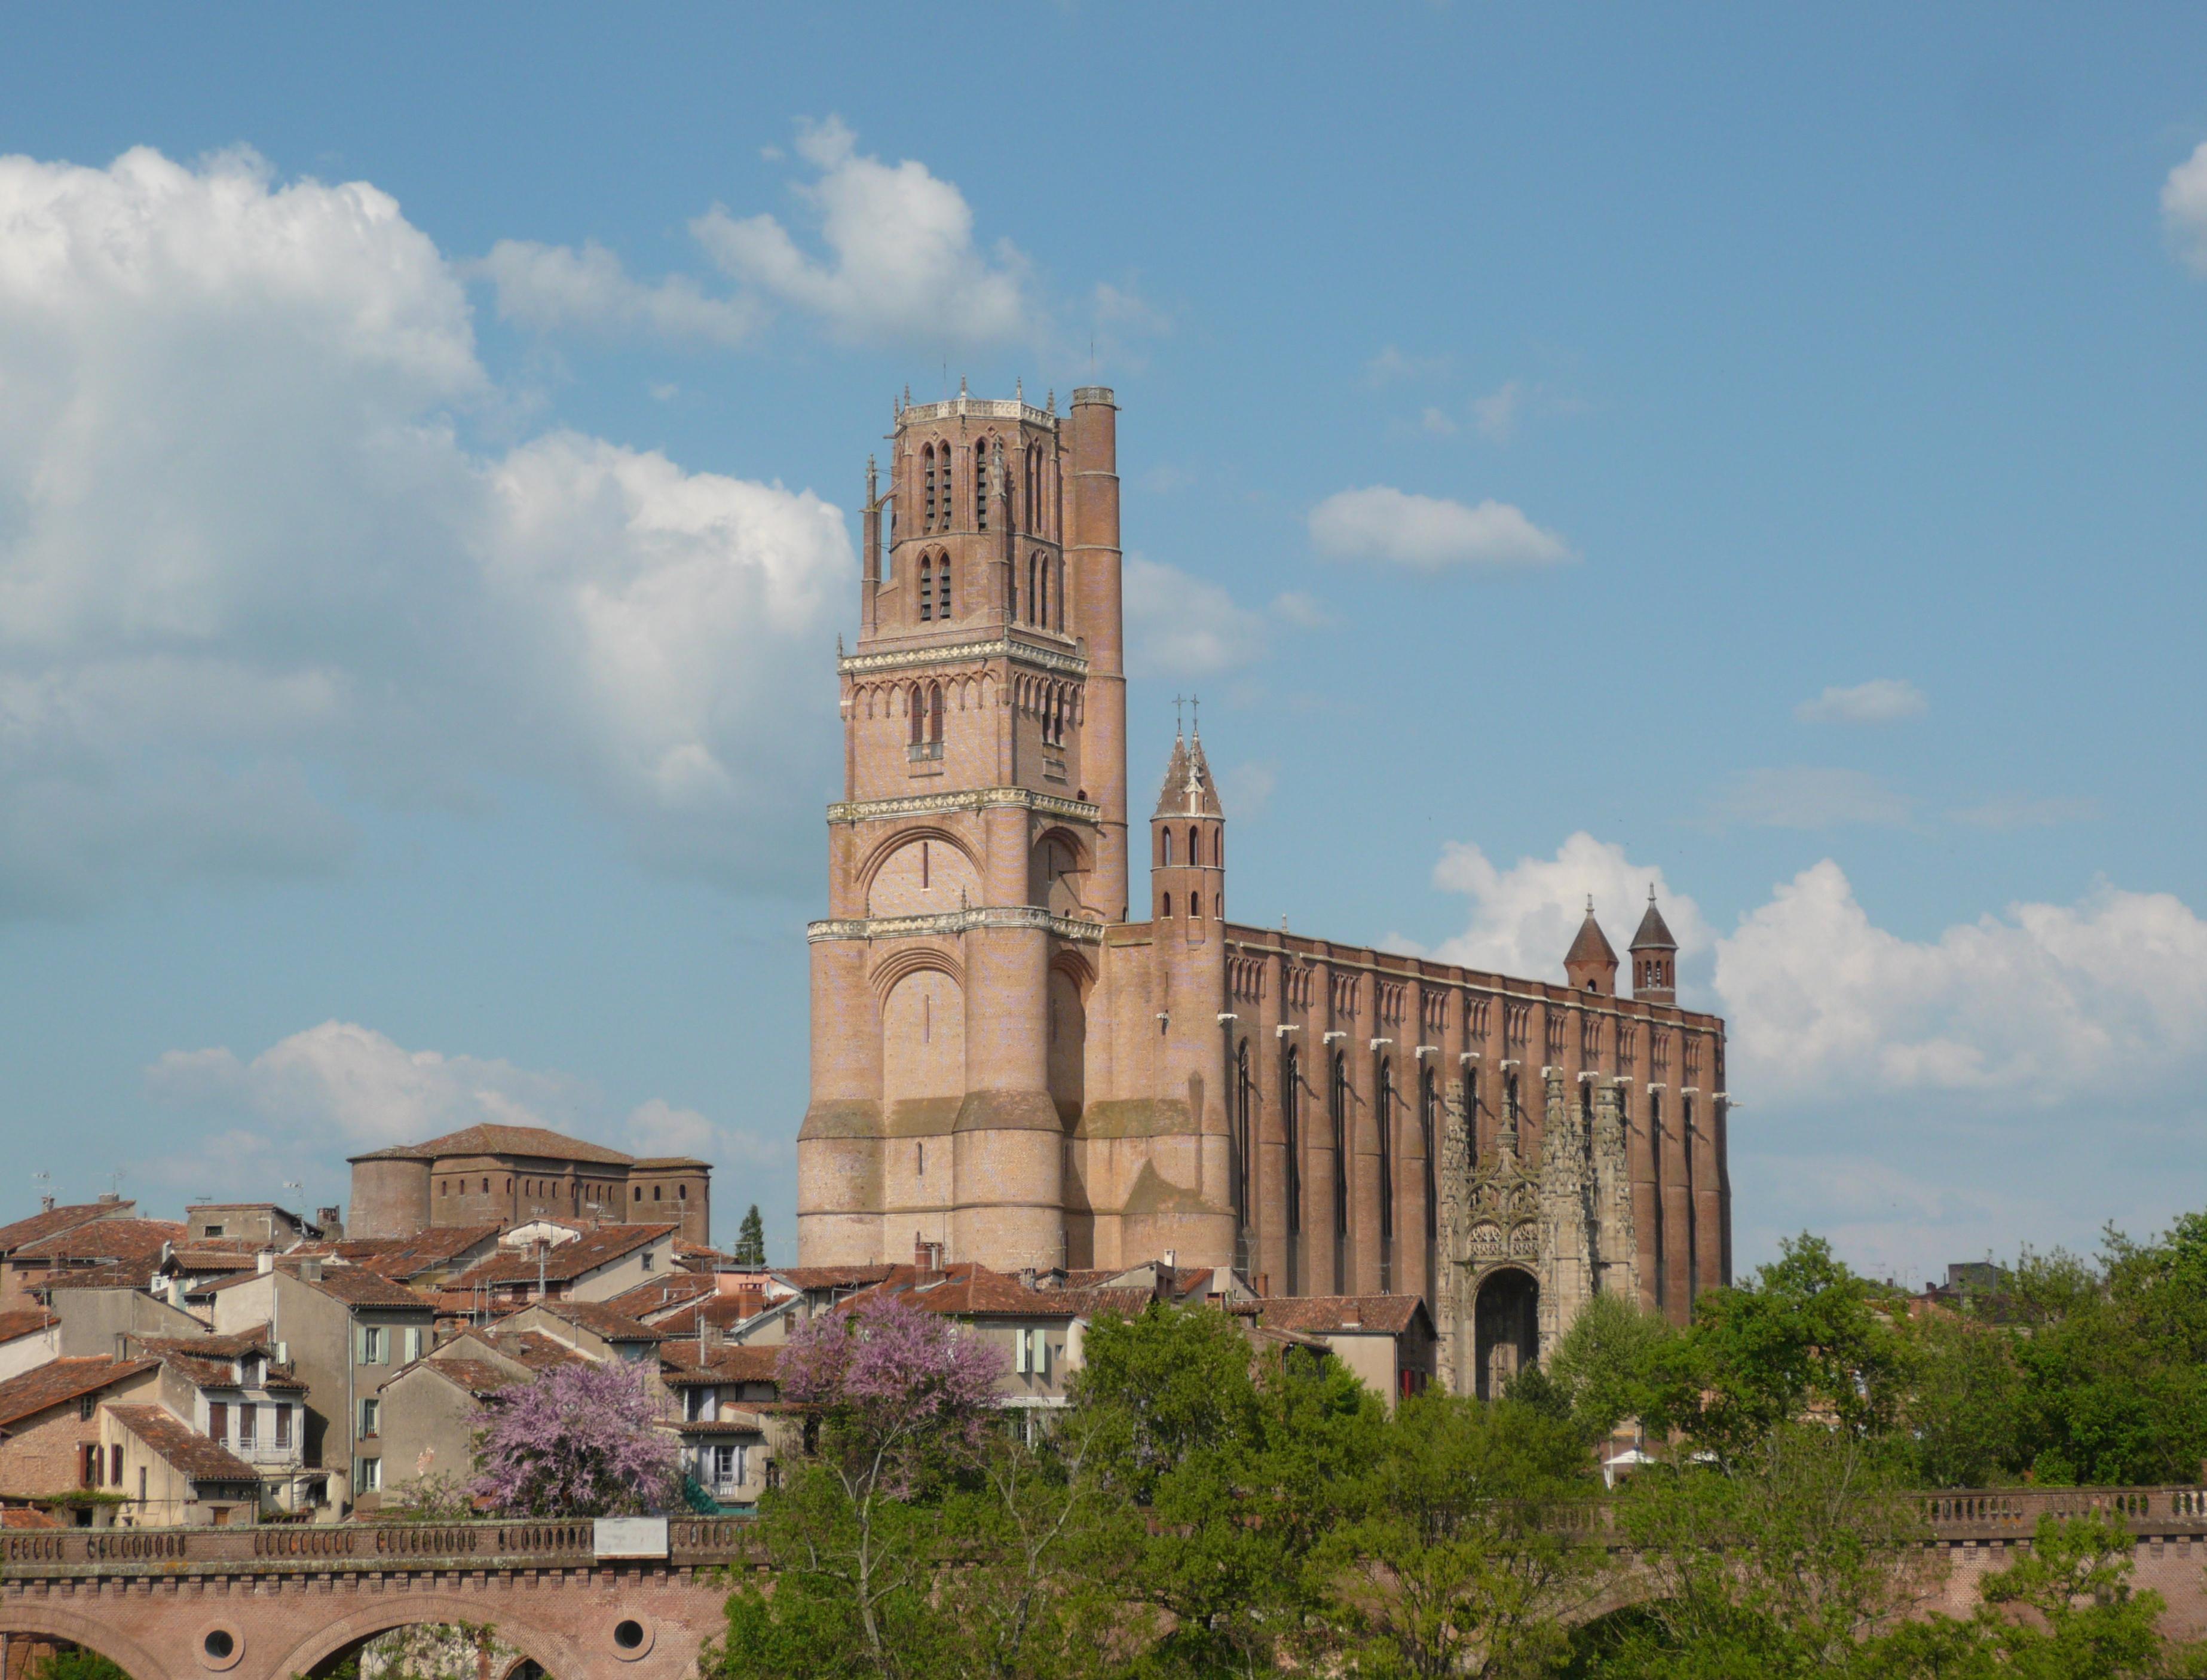 Katedrála svaté Cecilie (Albi)